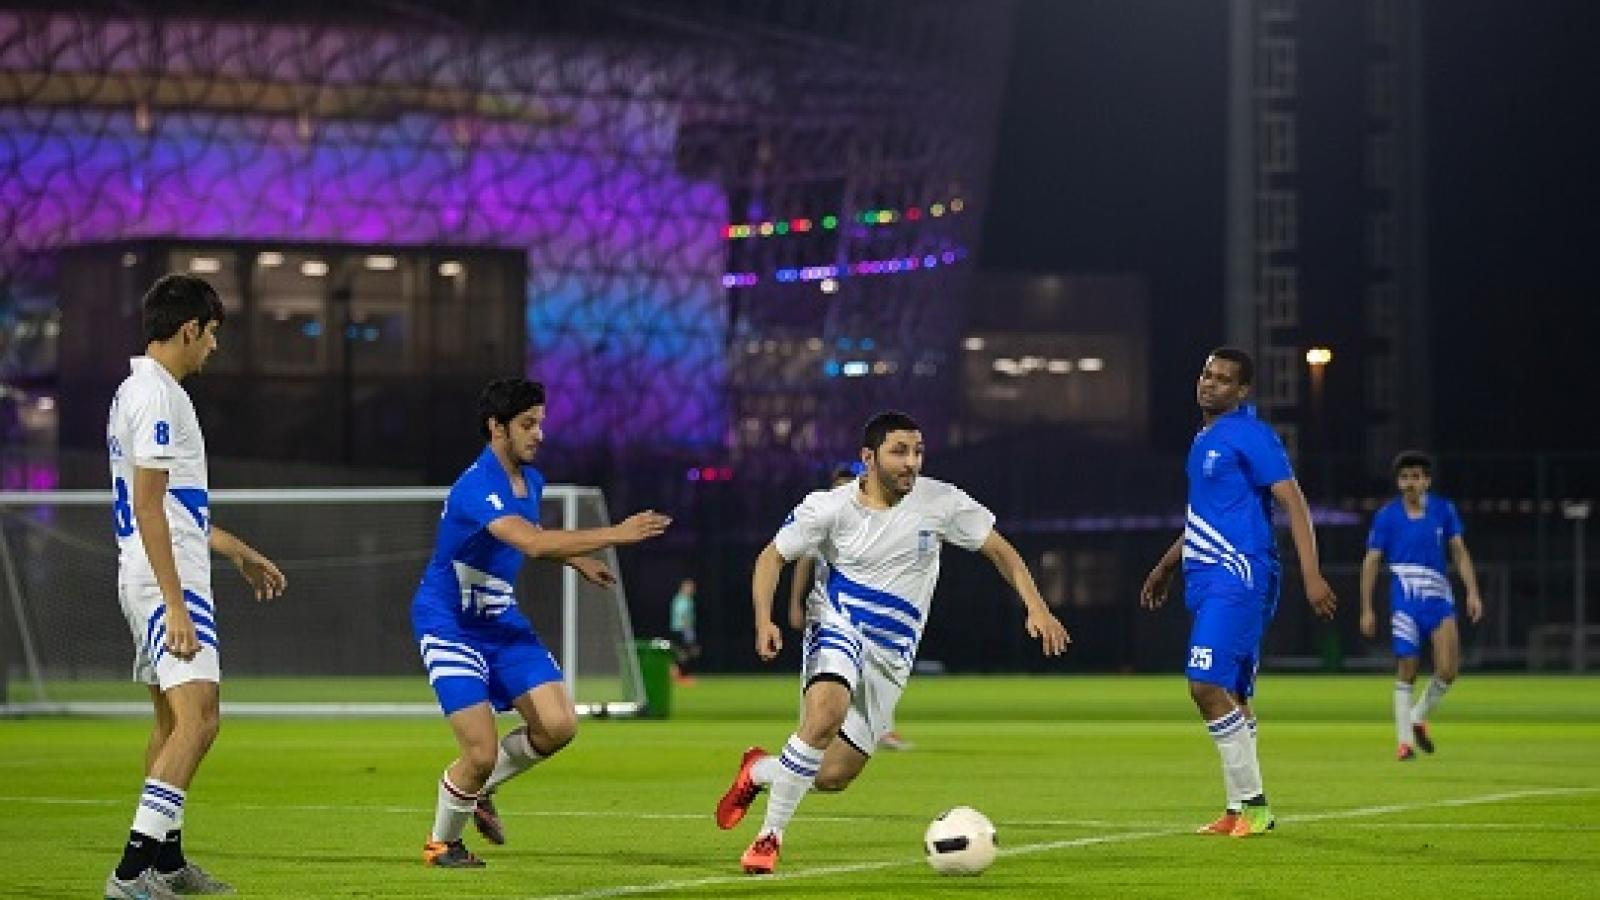 Qatar Community Football League to host football tournament at Qatar 2022 training sites